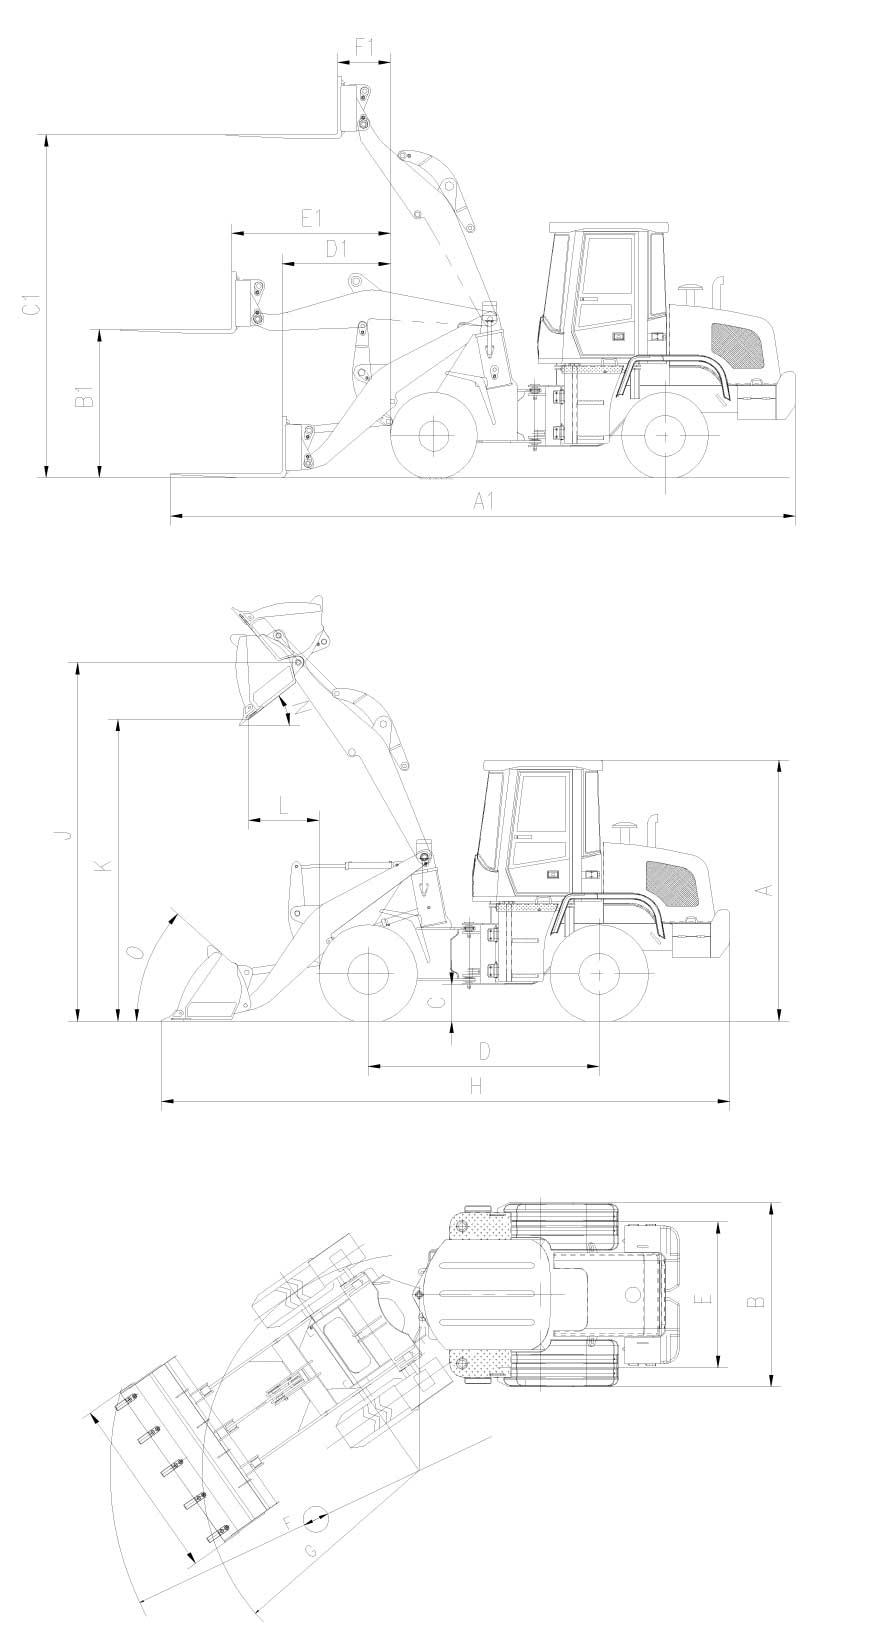 6050 SCHMiDT Wheel Loader